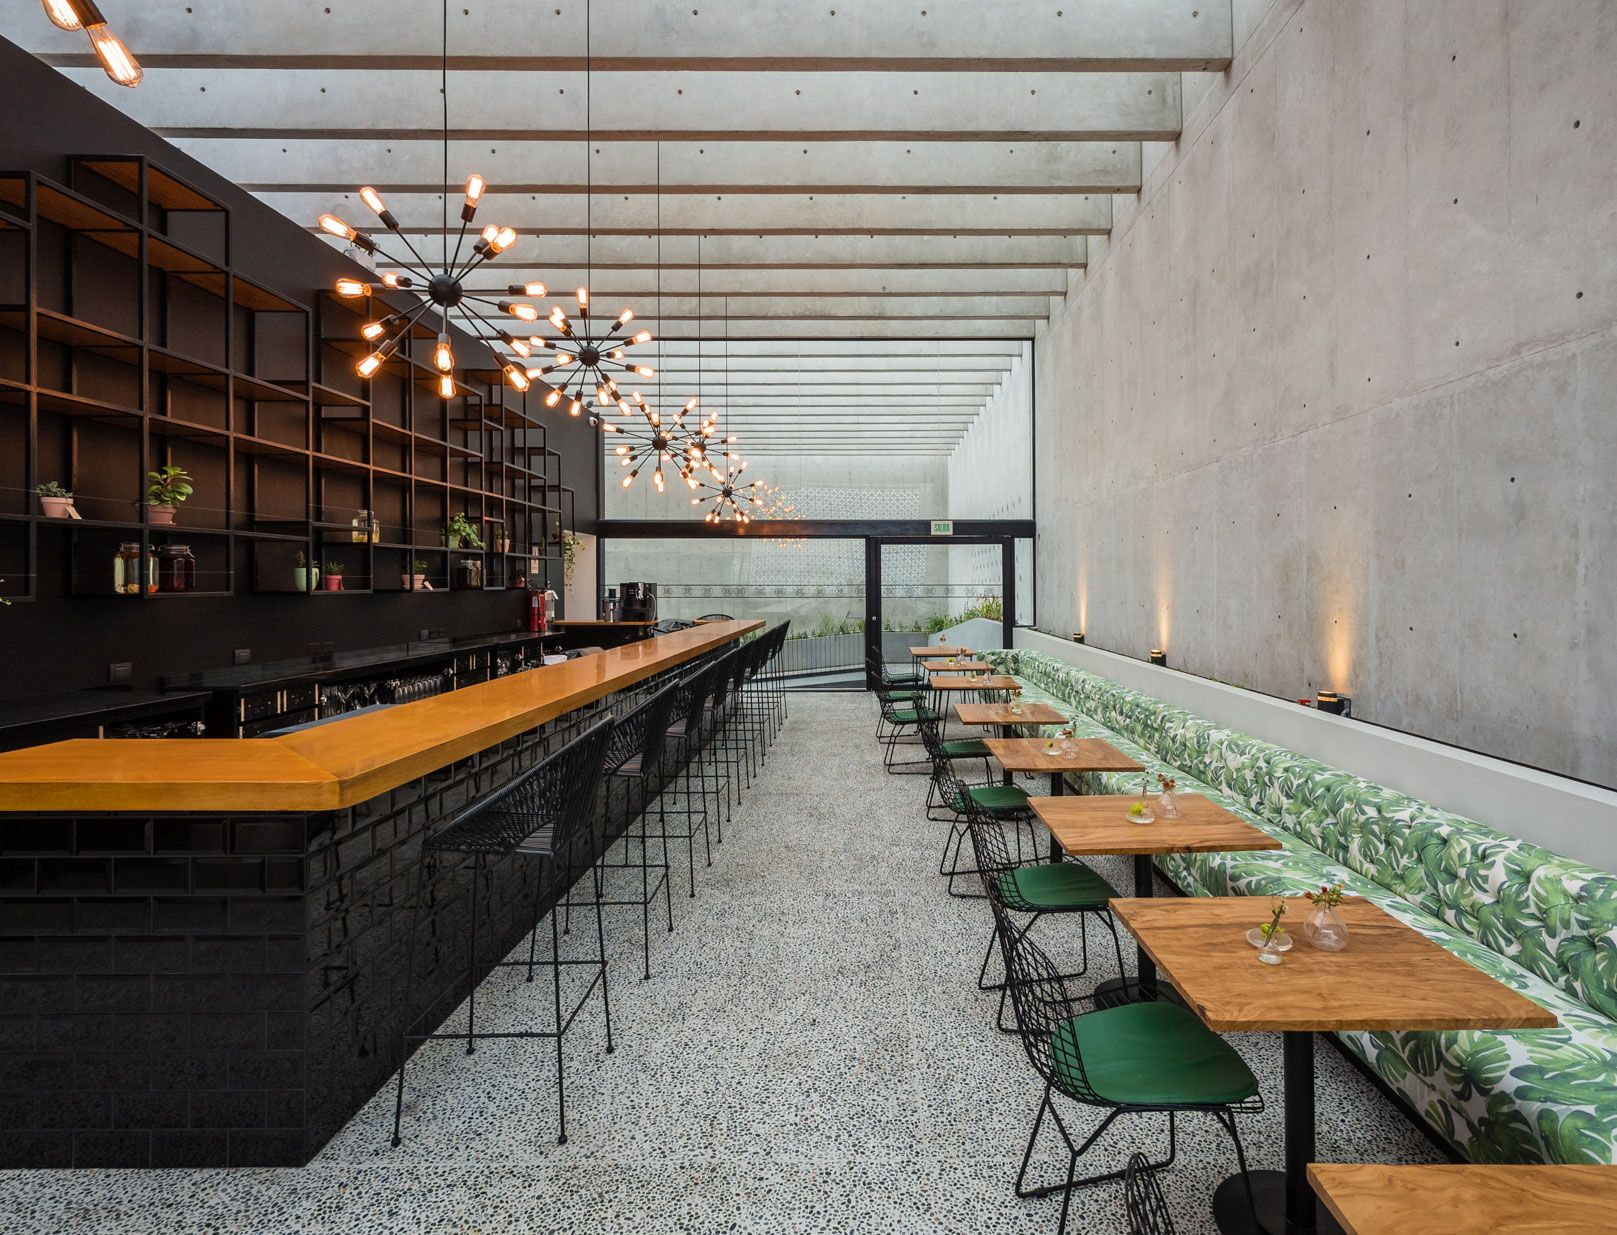 Edificio Morphology By Talia Valdez N Mena Arquitectura  # Muebles Pedro Baquero